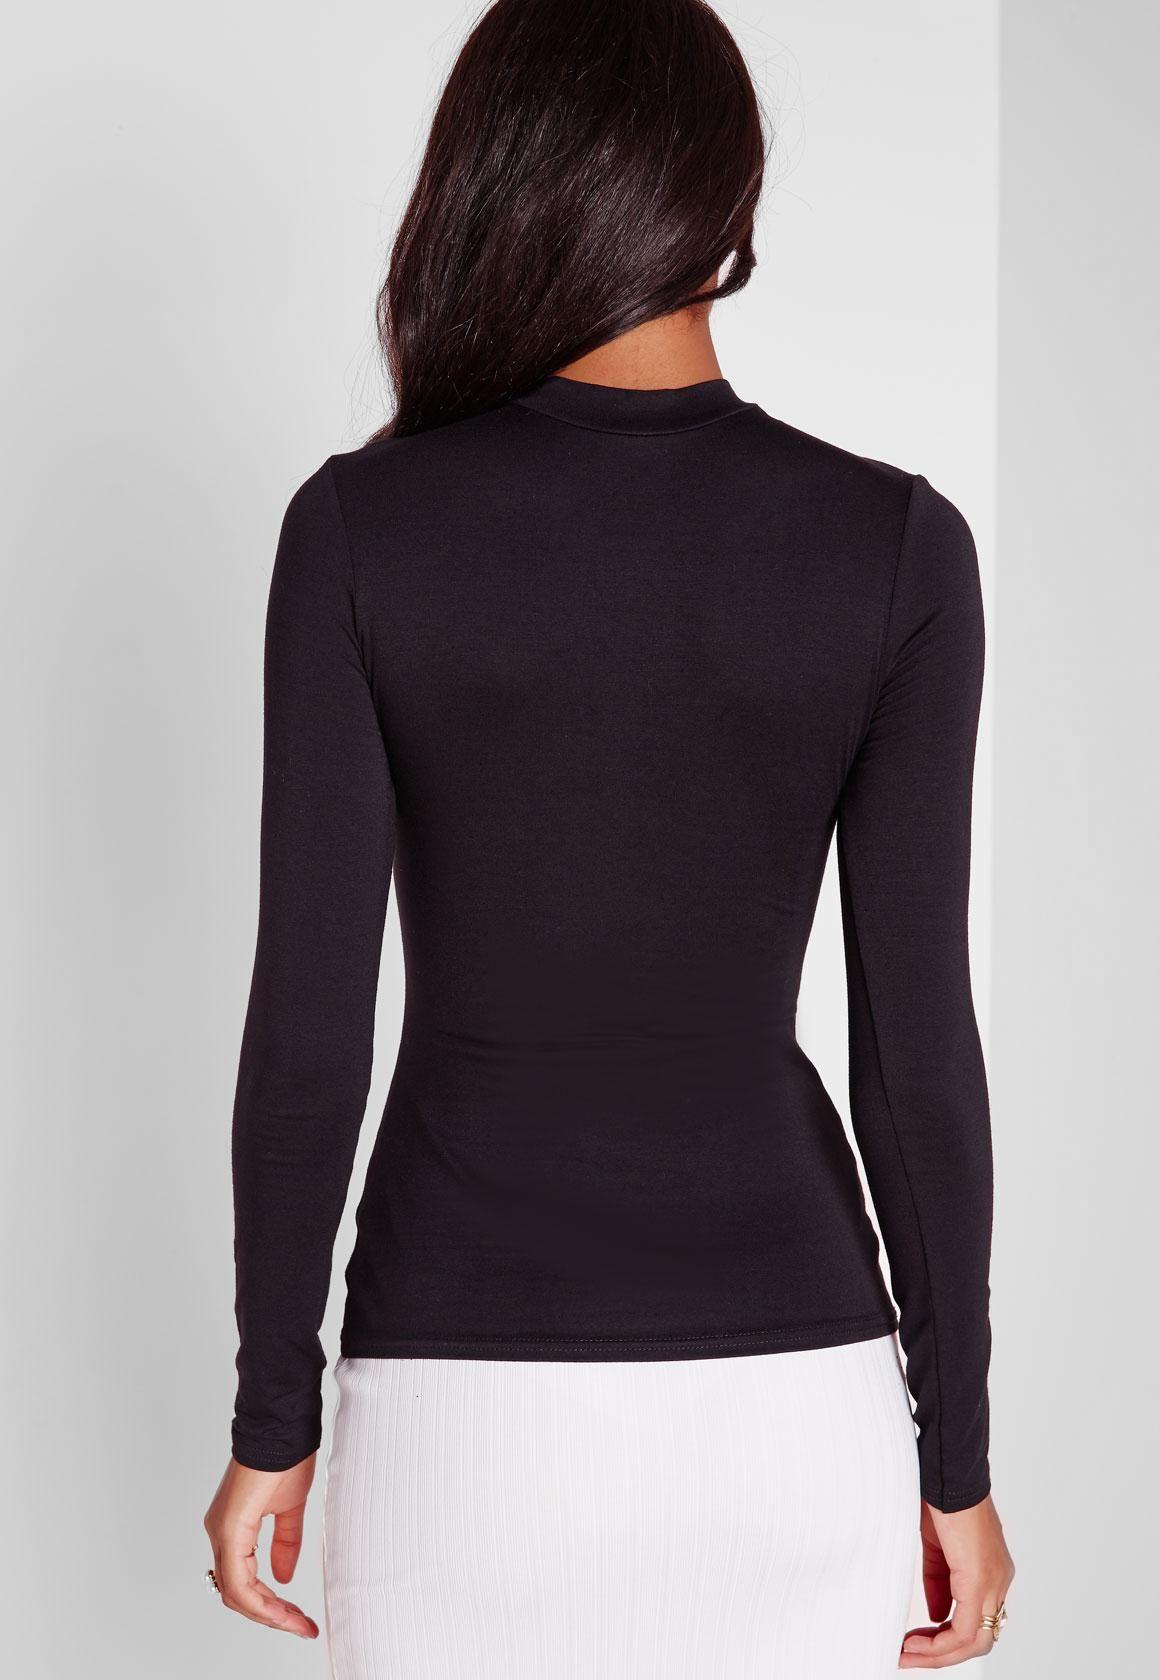 75142fff9f66ed Black Long Sleeve Turtle Neck Top  Sponsored  Sleeve